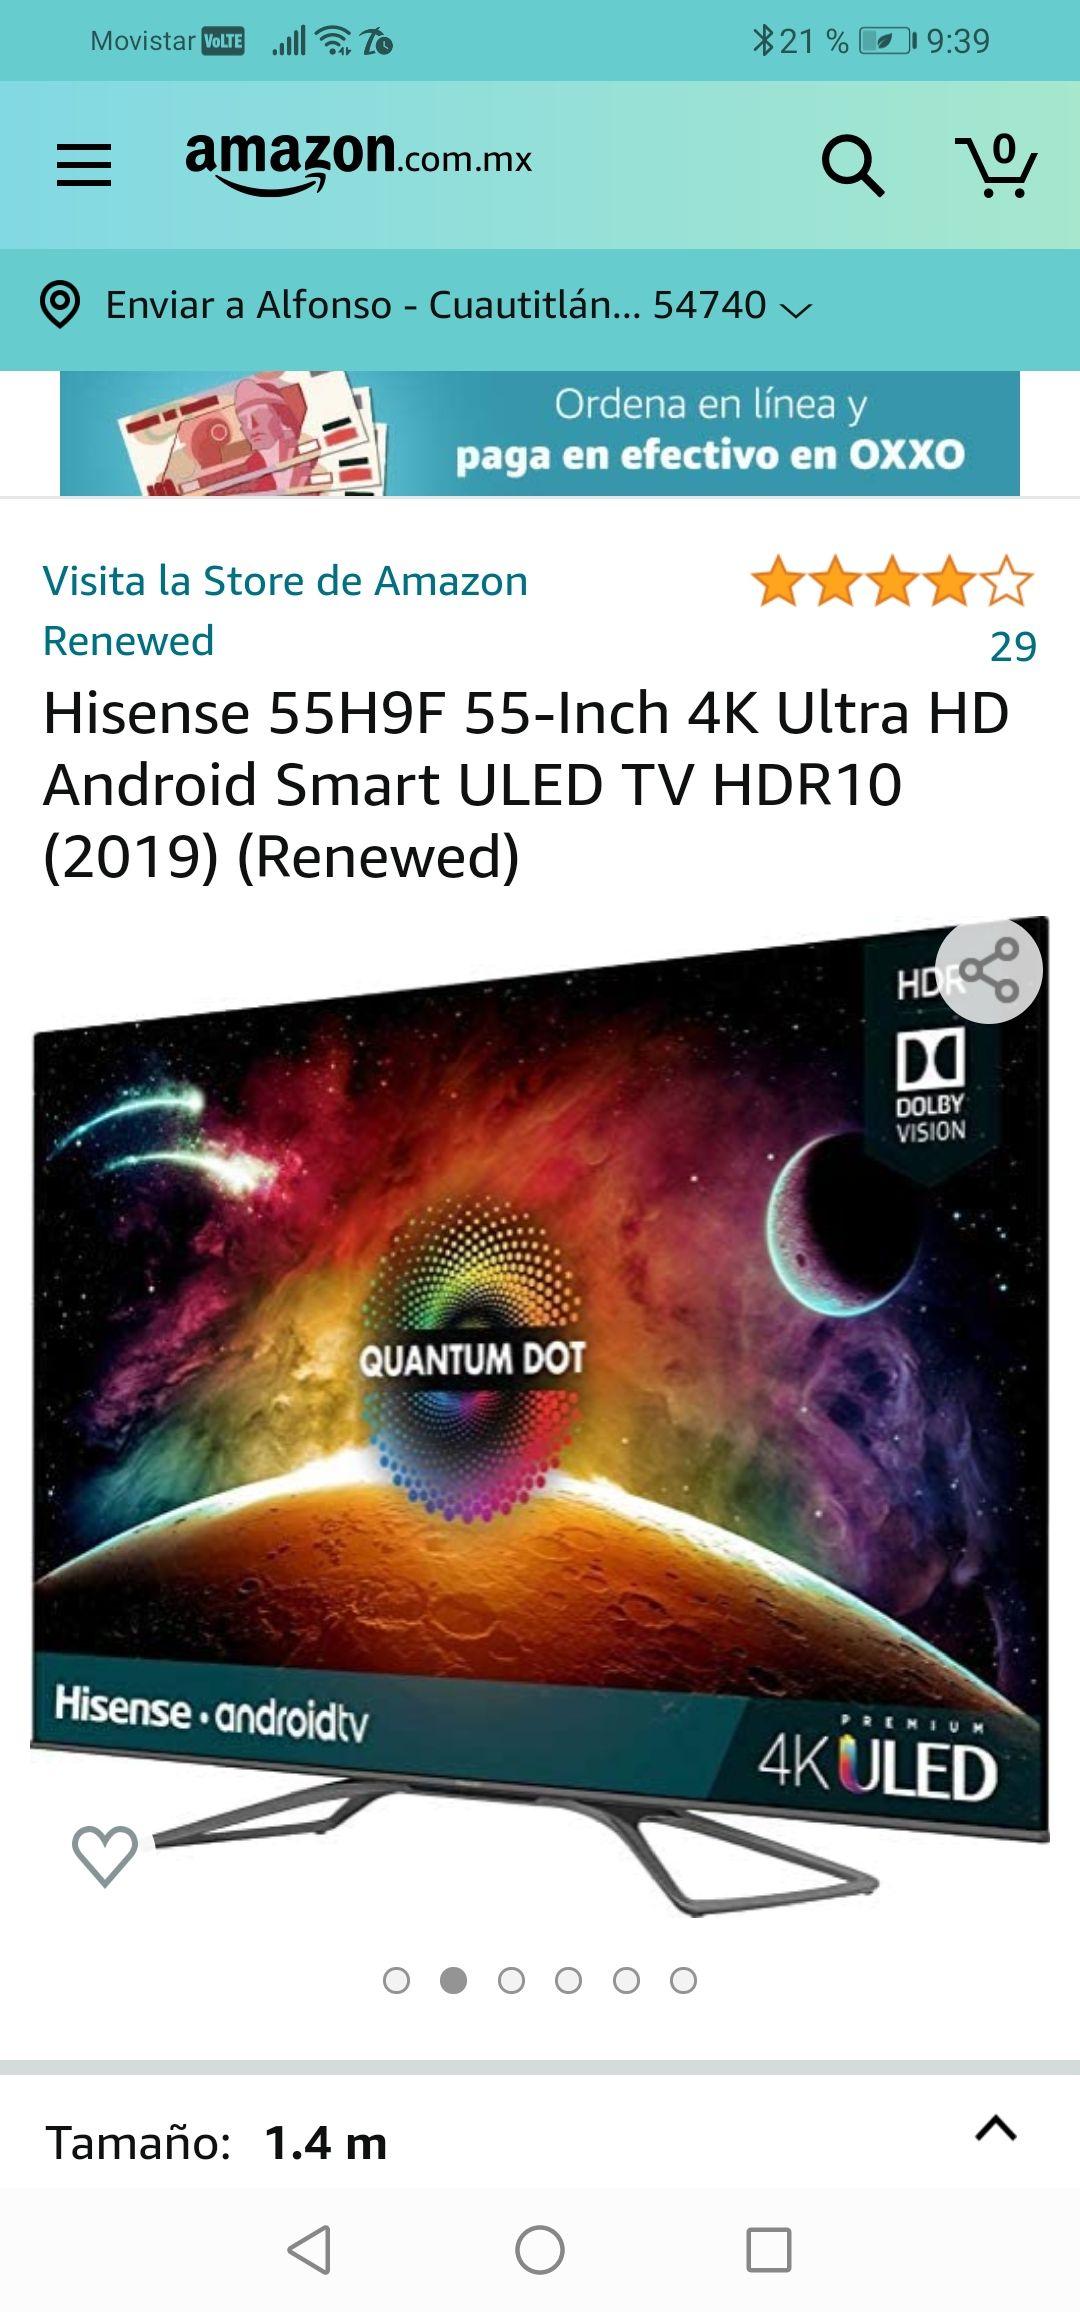 Amazon : Hisense 55H9F 55-Inch 4K Ultra HD Android Smart ULED TV HDR10 (2019) (Renewed)